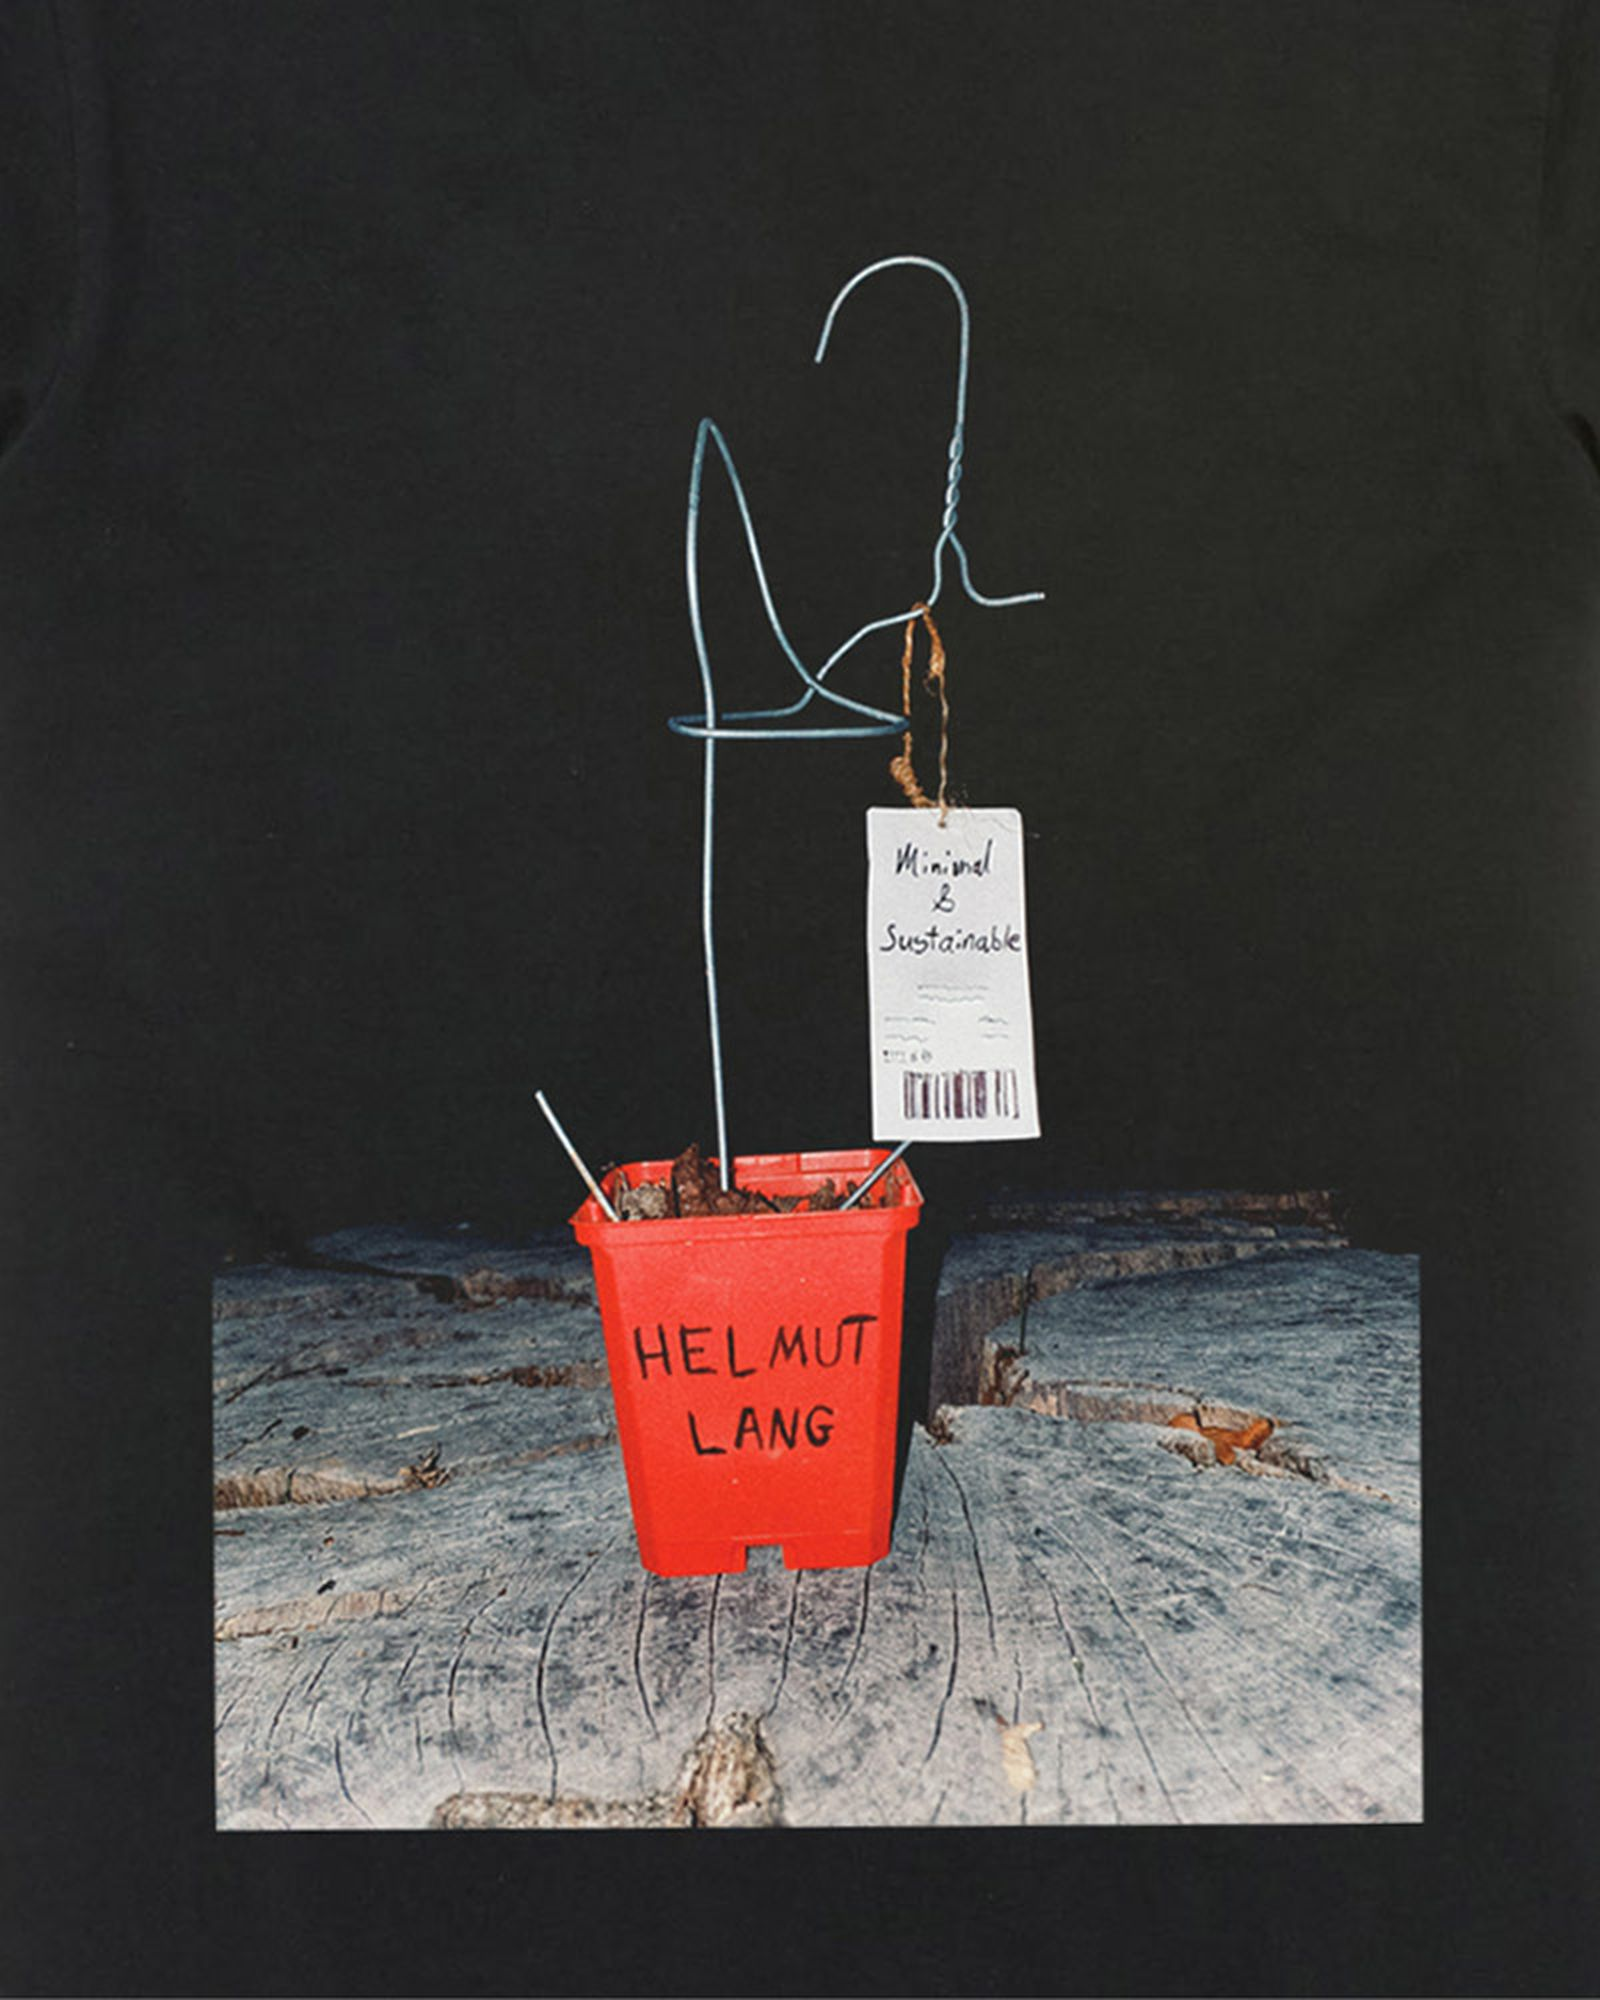 22helmut-lang-t-shirt-design-competition